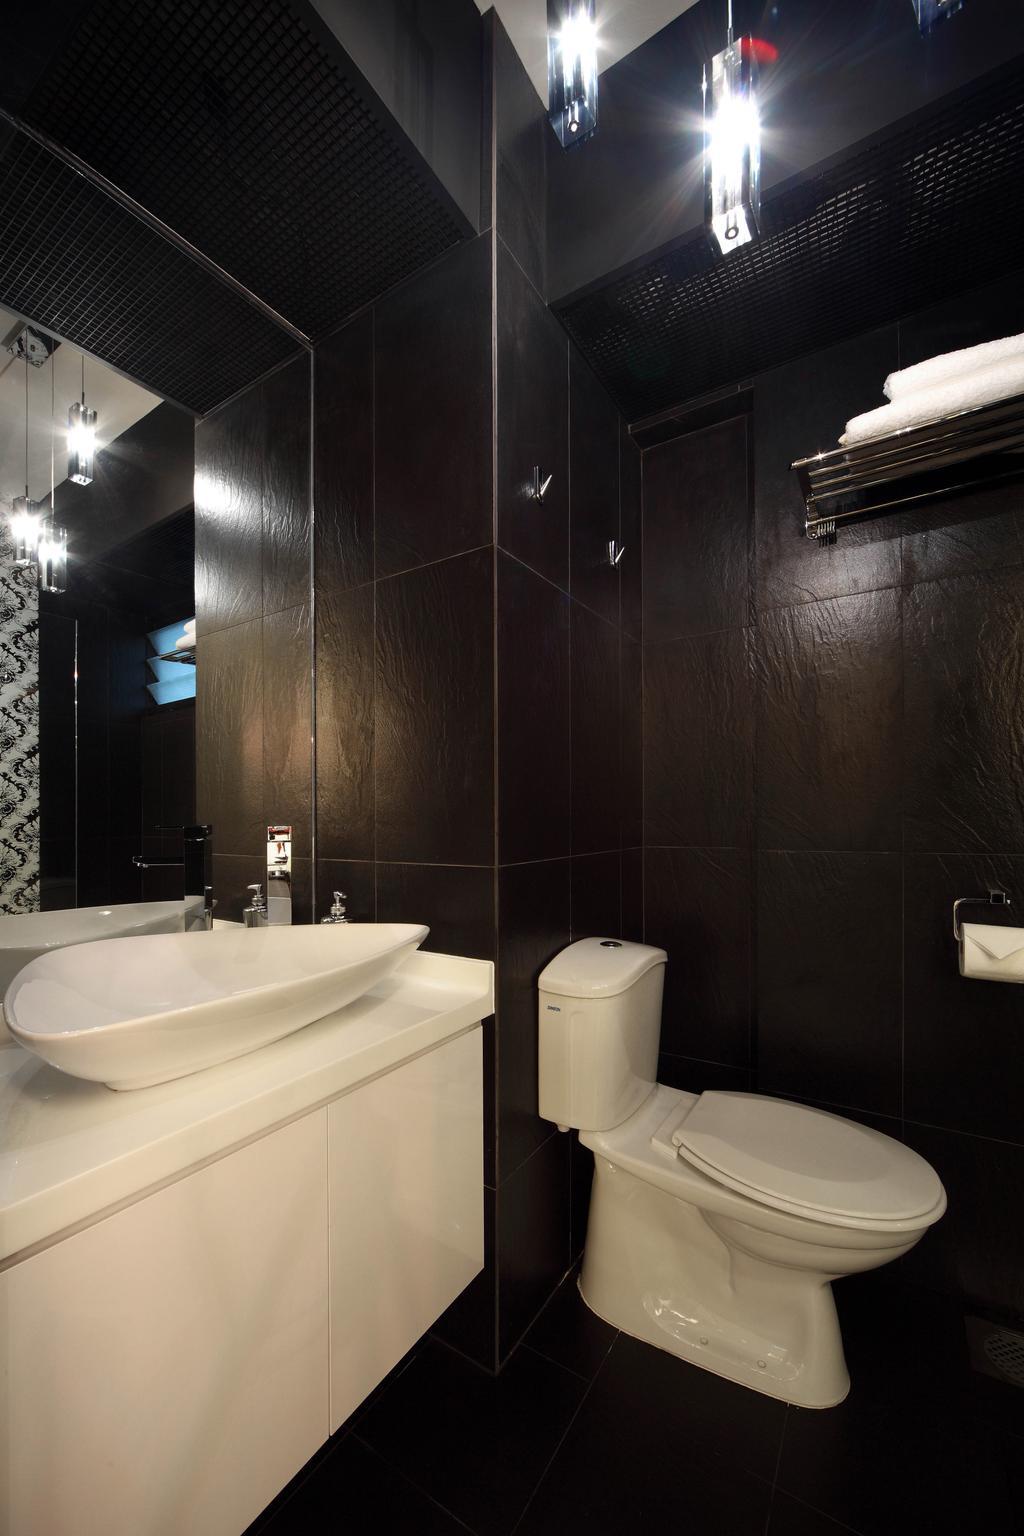 Transitional, HDB, Bathroom, Sengkang West Avenue (Block 438B), Interior Designer, De Exclusive Design Group, Toilet Bowl, Water Closet, Bathroom Vanity, Mirror, Bathroom Sink, Sink, Dark Walls, Dark, Towel Rack, Black Walls, Indoors, Interior Design, Room